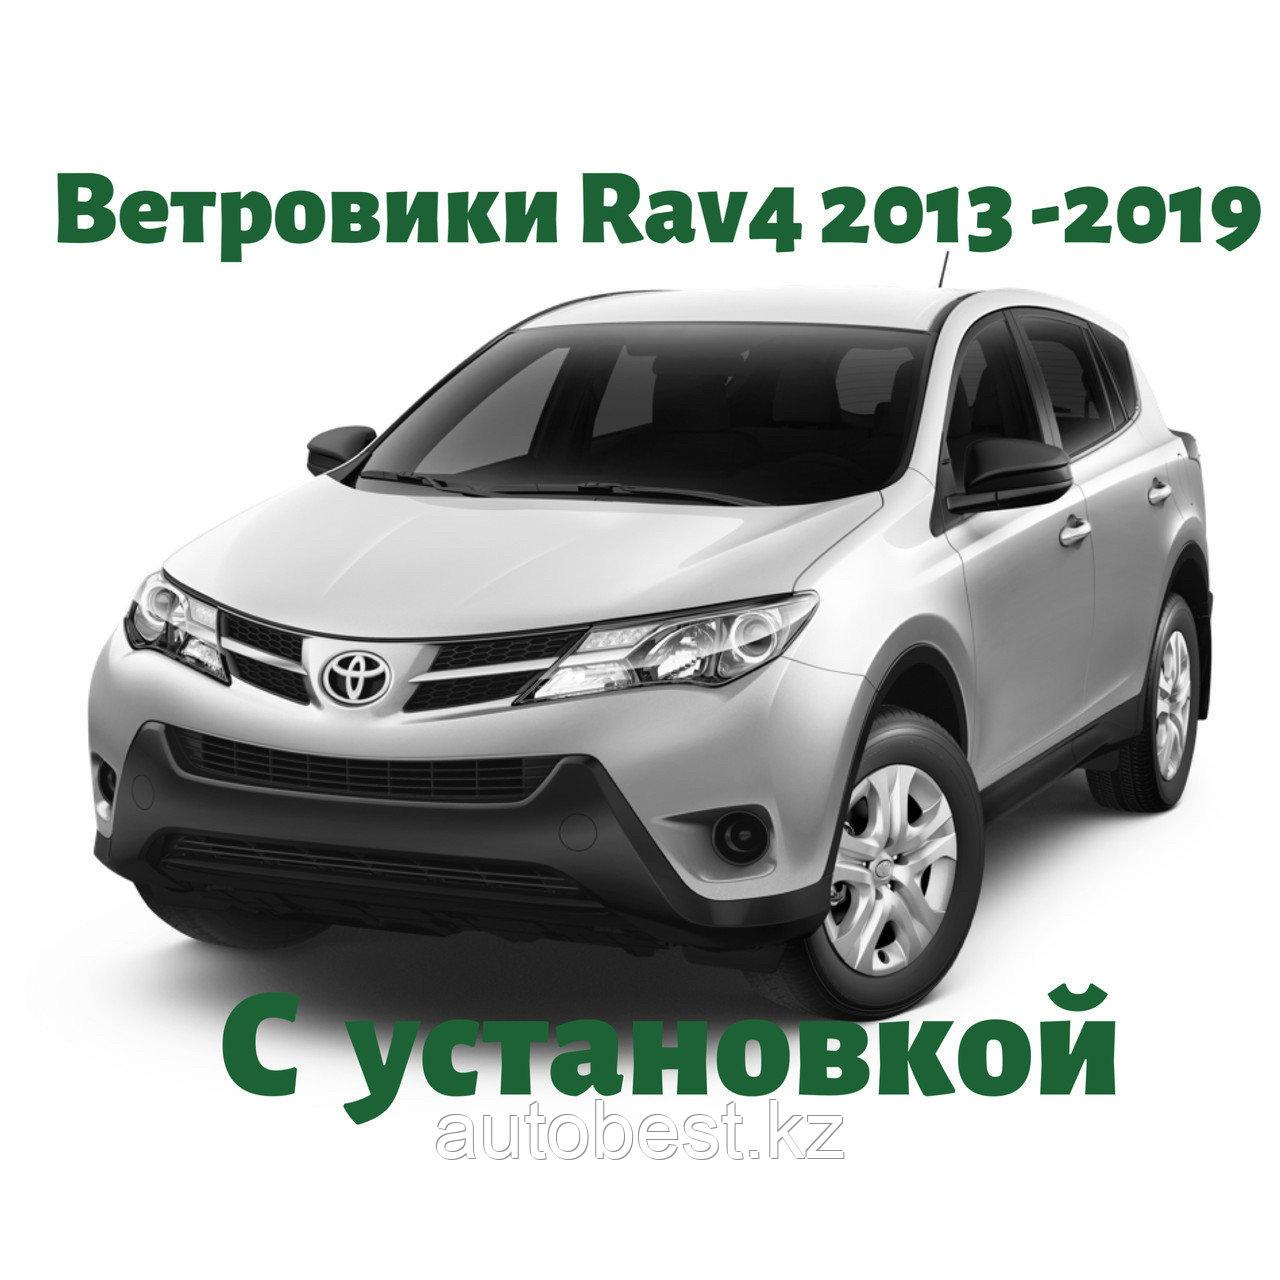 Ветровики на Toyota Rav4 2013 2014 2015 2016 2017 / дефлектор Тойота Рав4 2013 2014 2015 2016 2017